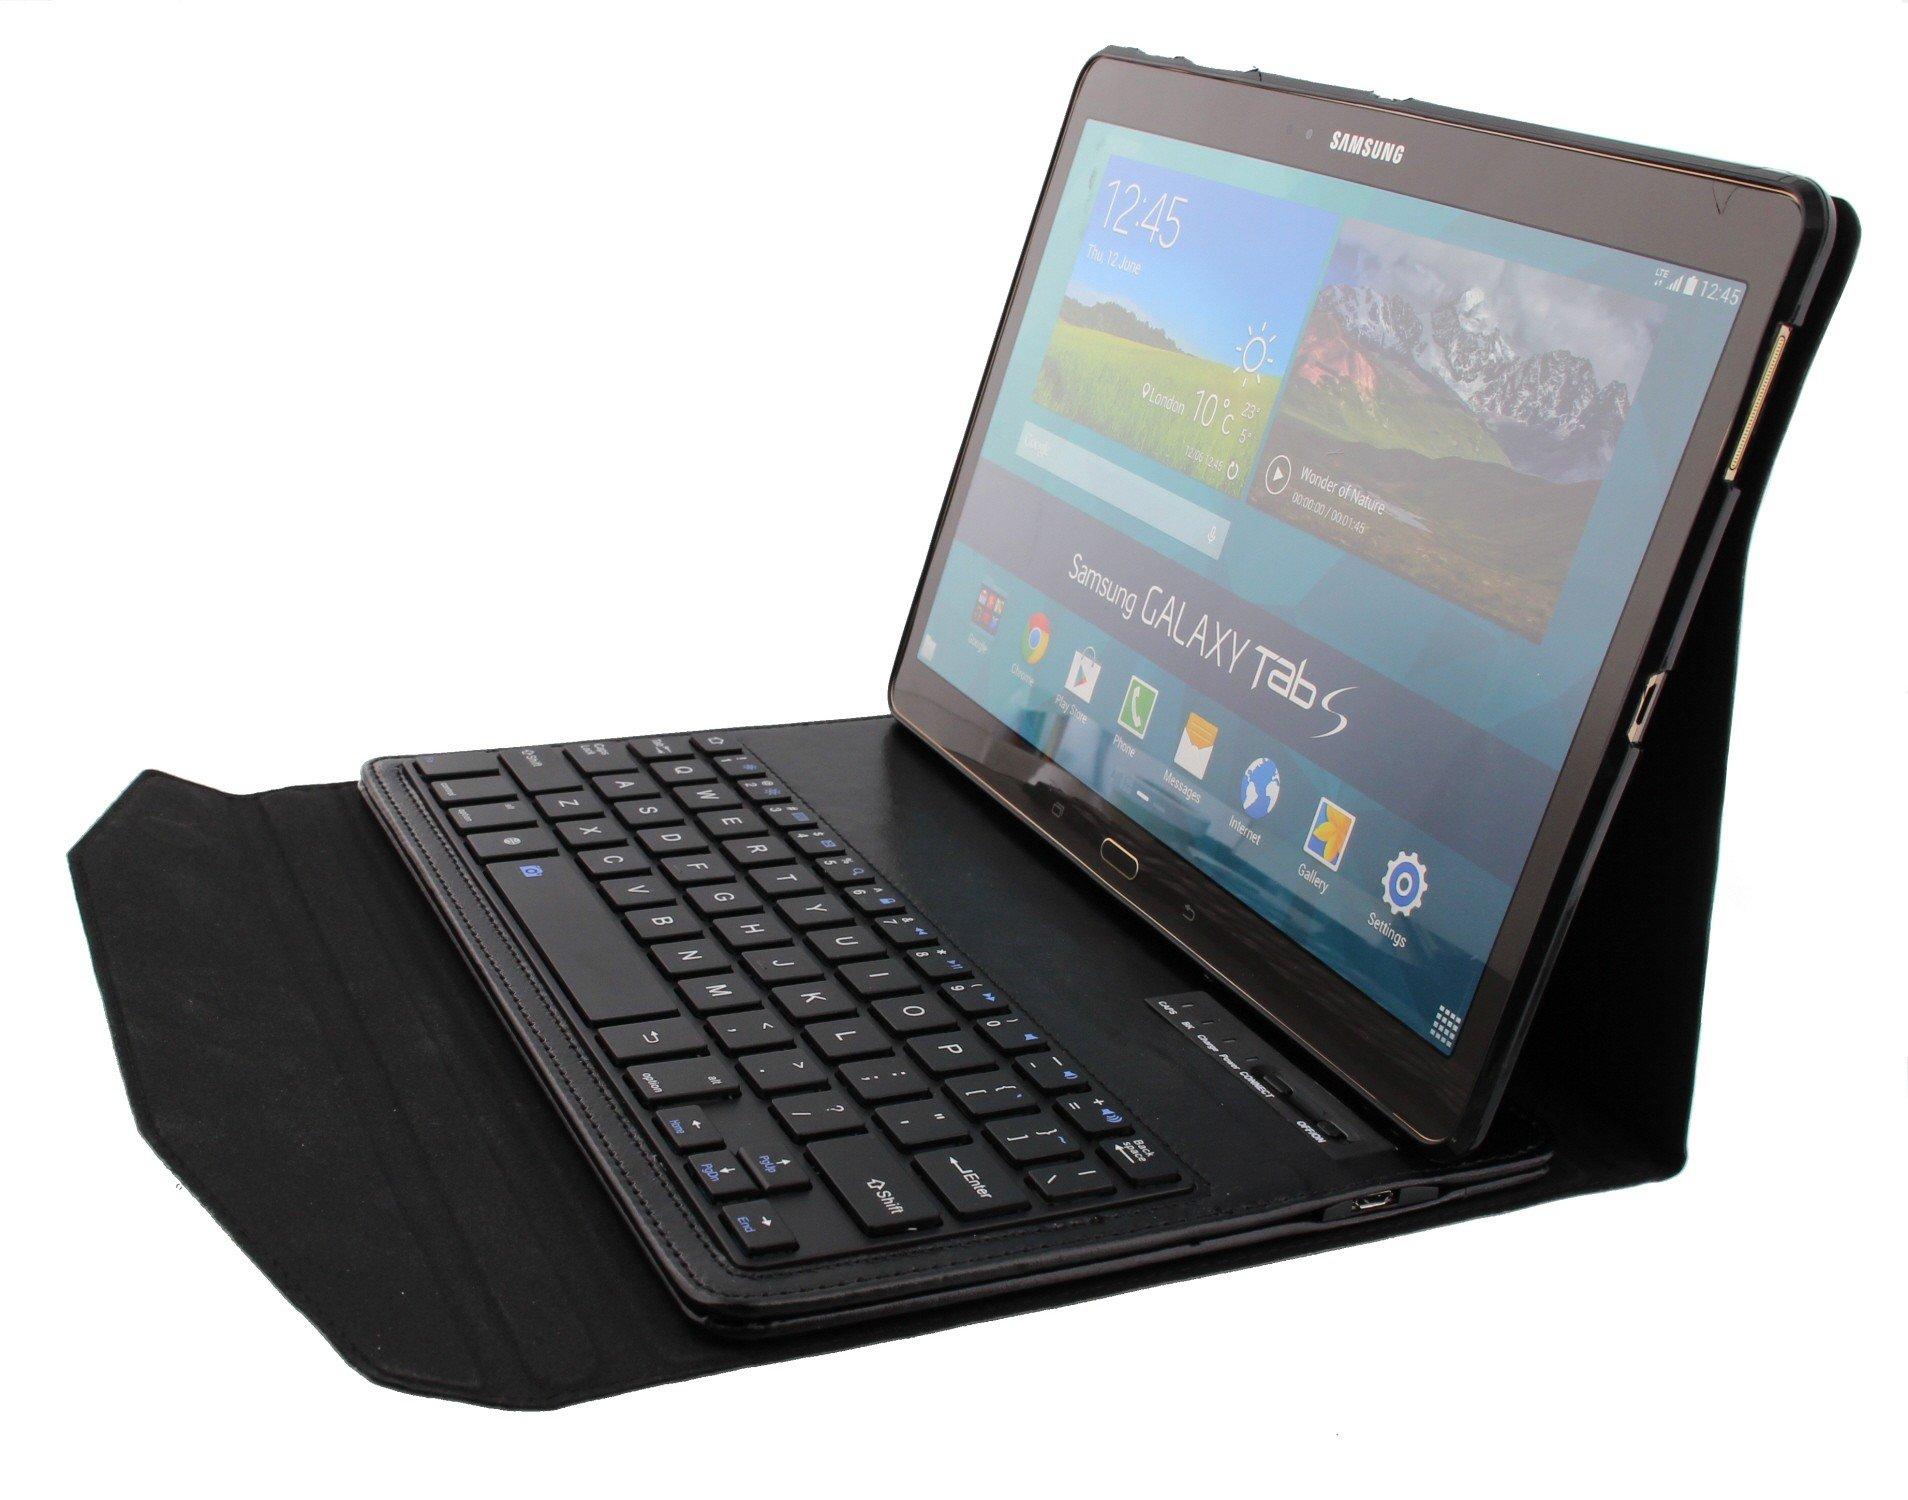 hoes met toetsenbord samsung galaxy tab s 10 5 tablet. Black Bedroom Furniture Sets. Home Design Ideas